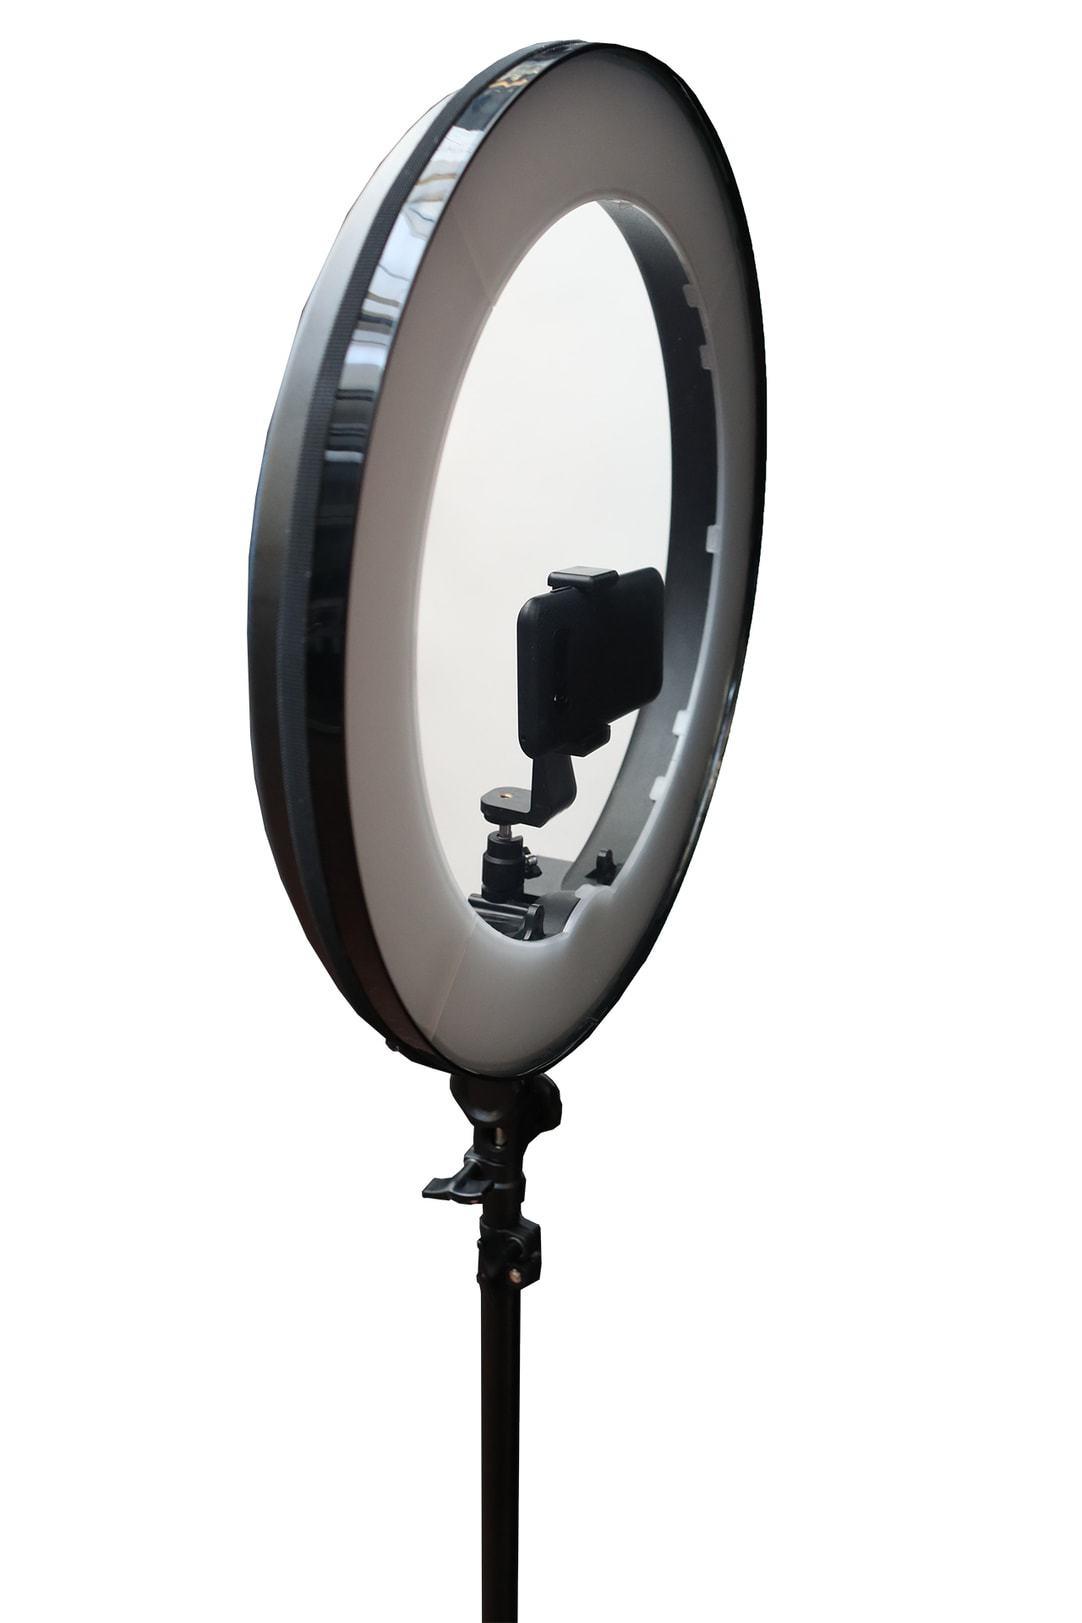 18″ Teleprompter Halo Mirror